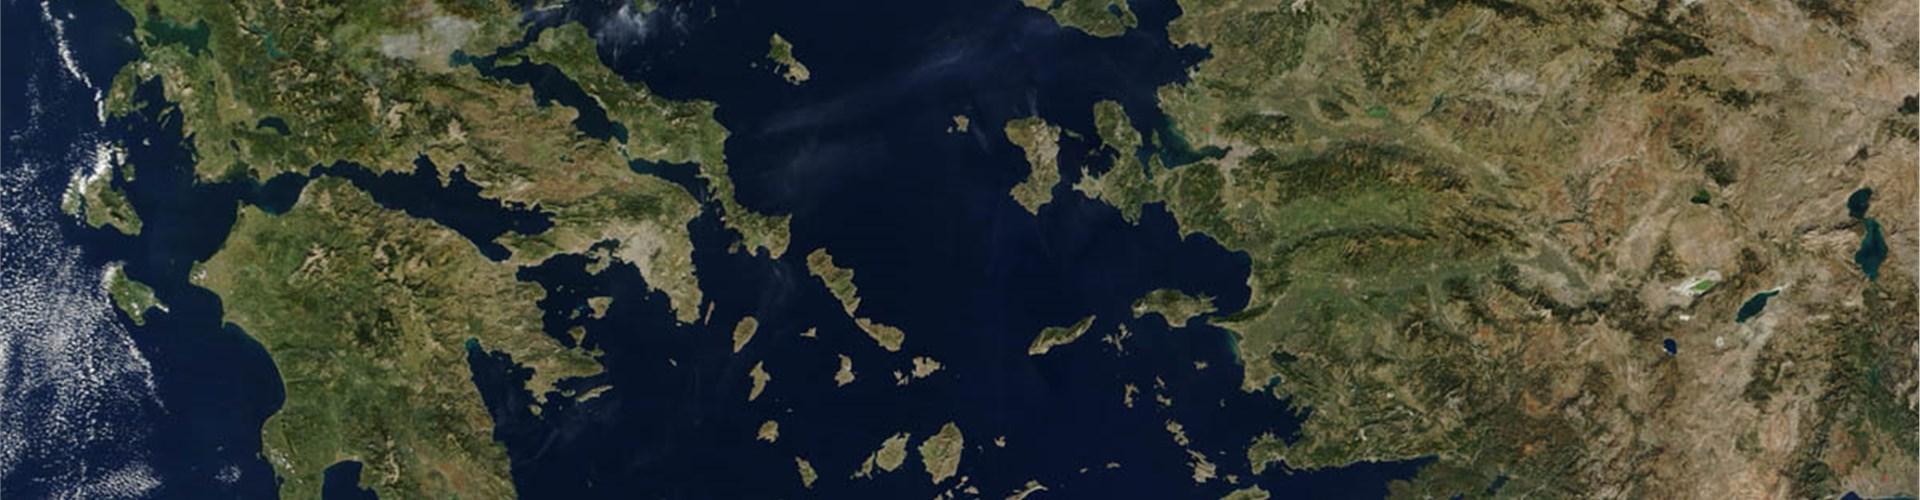 Where is Santorini